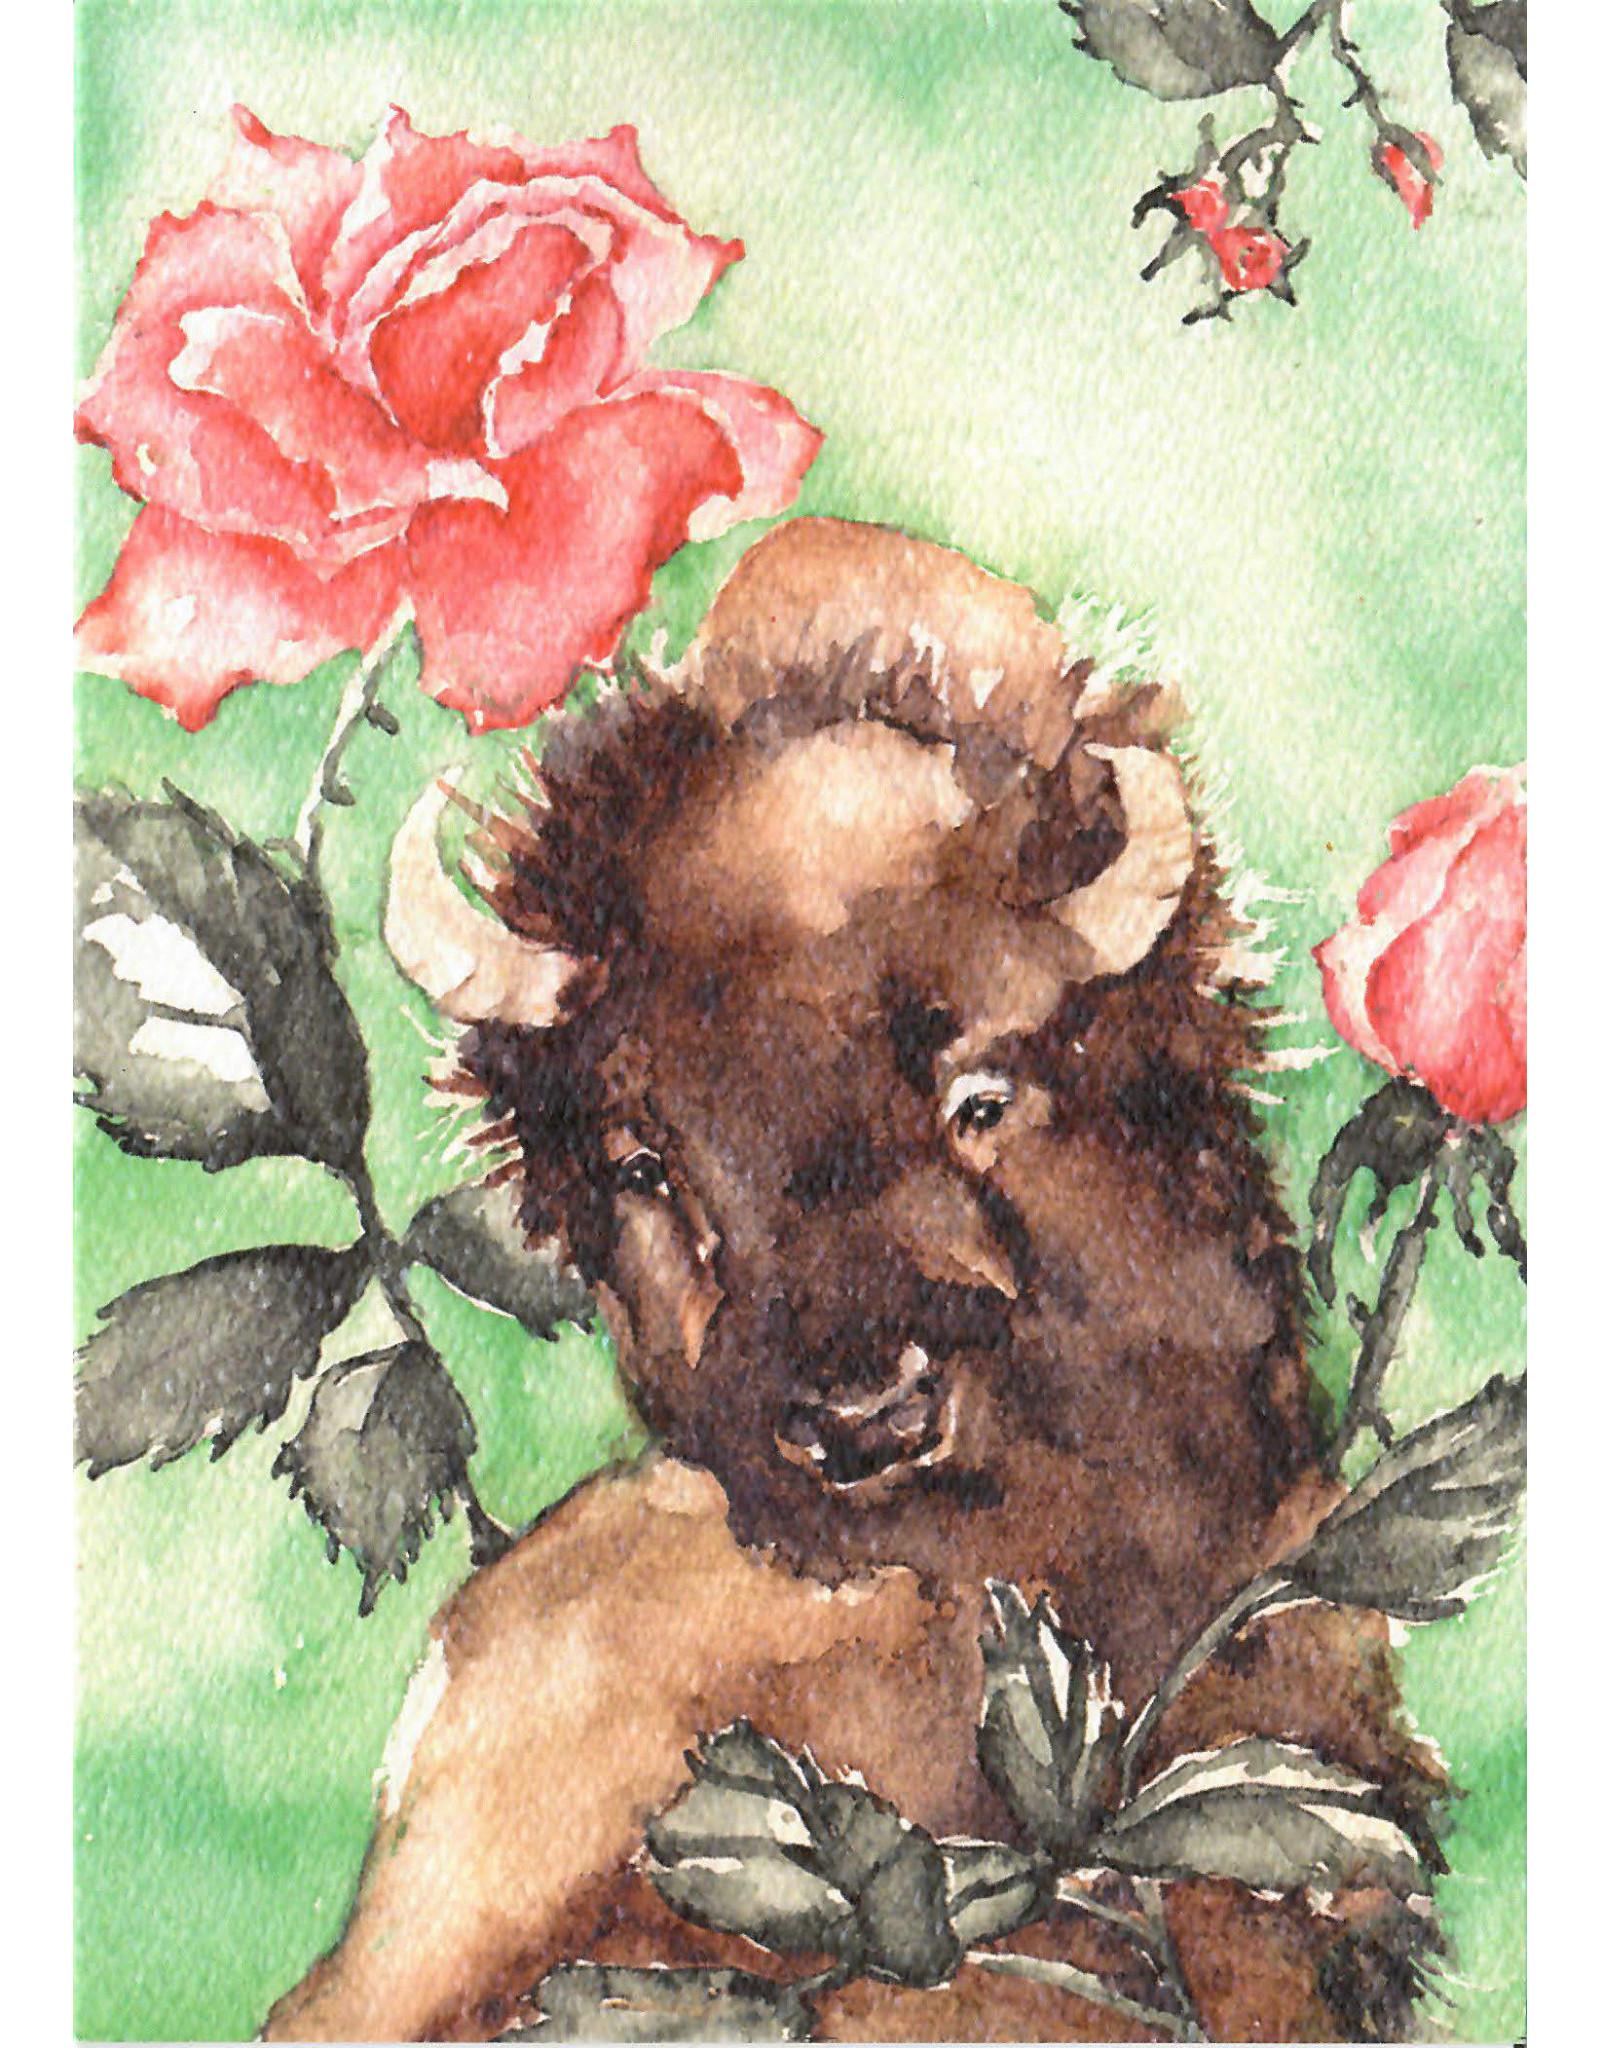 Scanlon, Rosemary Bison Icon - greeting card (blank